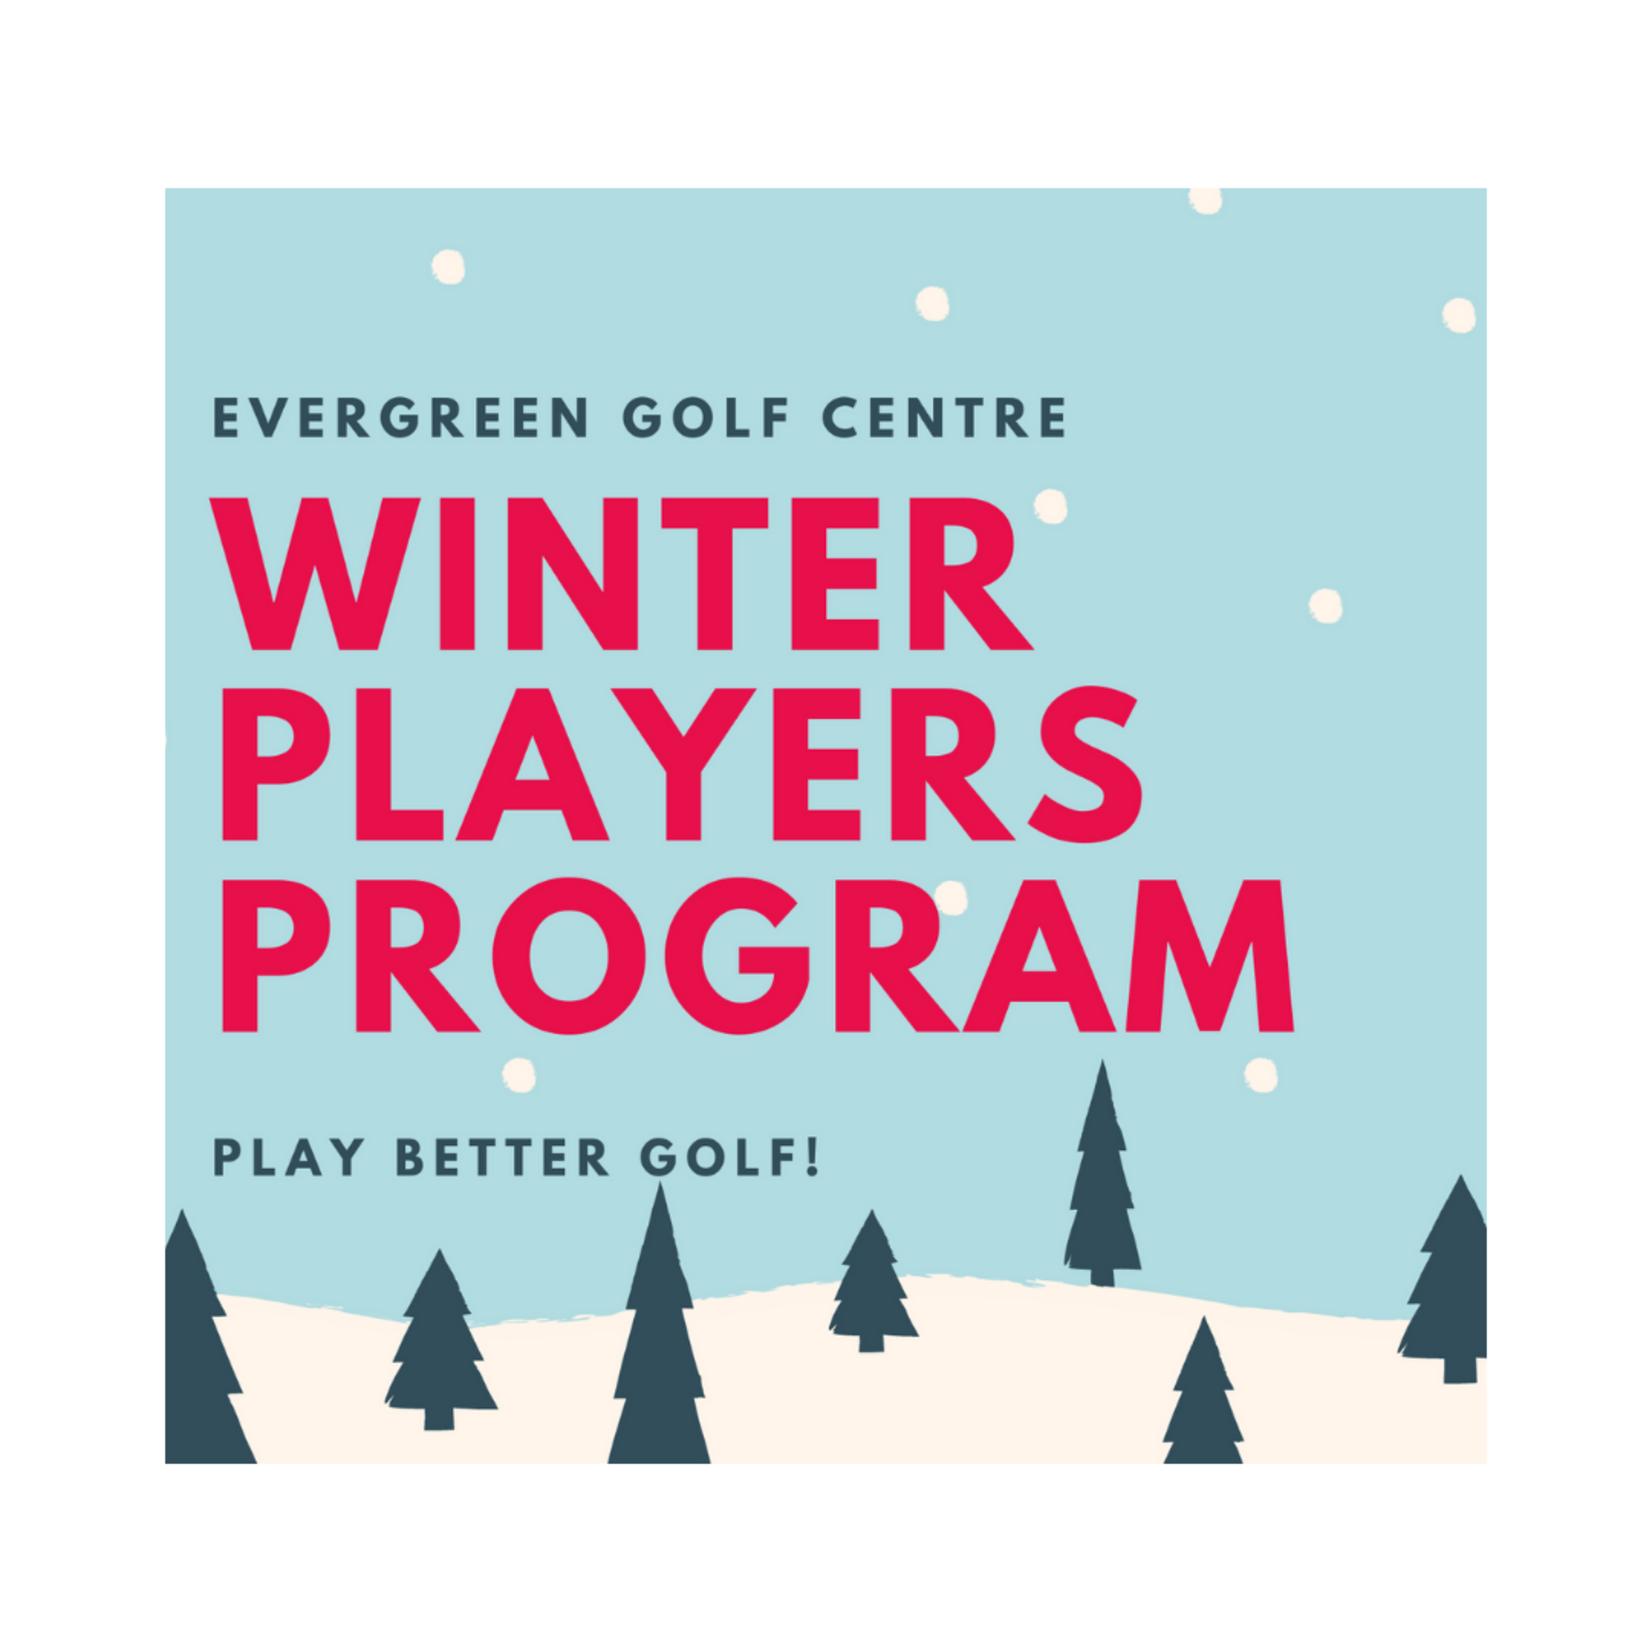 Winter Players Program Tournament Feb 6th - Mar 13th '22